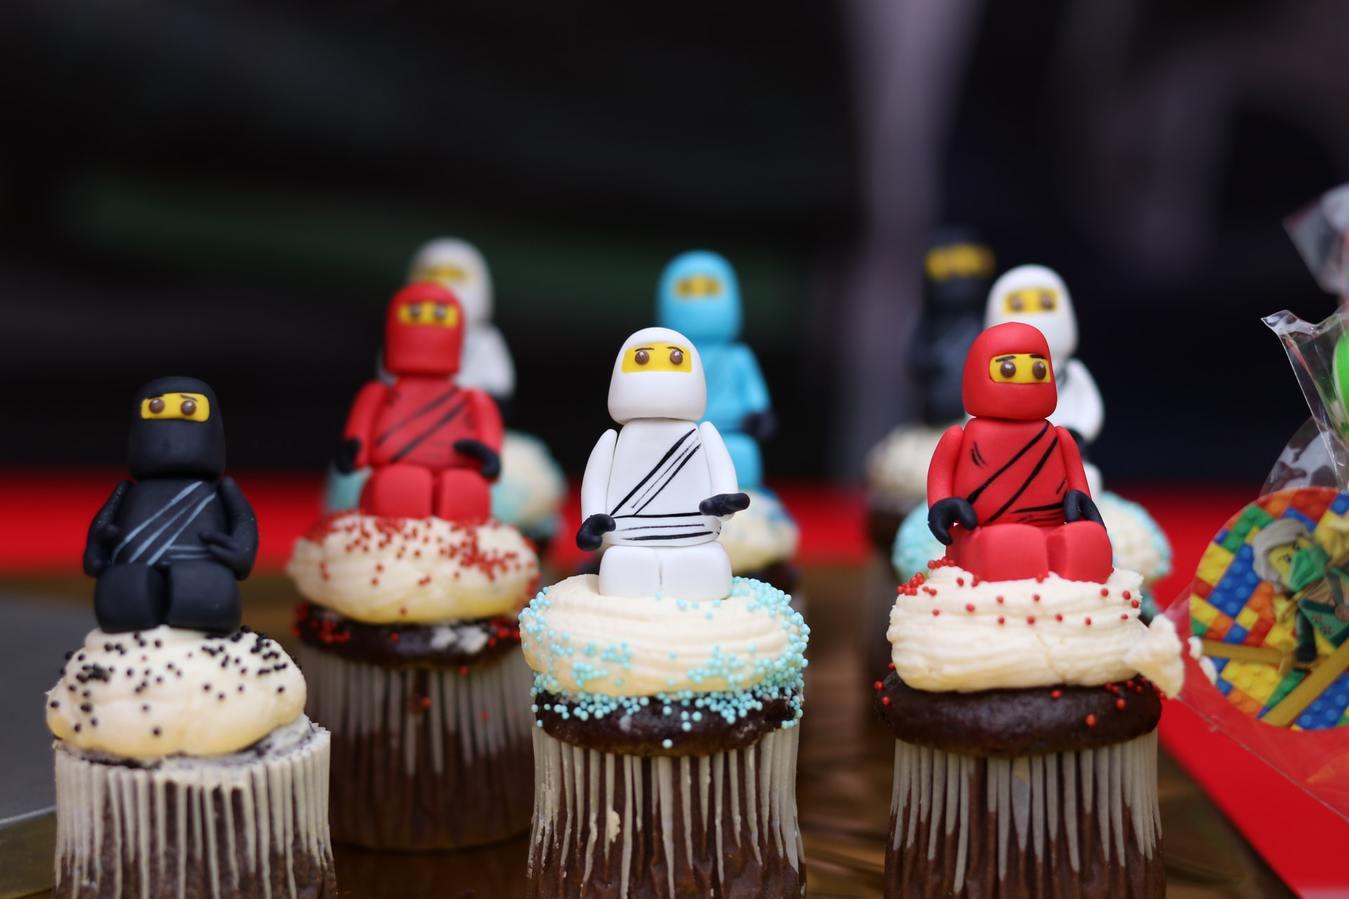 Cupcakes Lego Ninjago Figurines Handmade